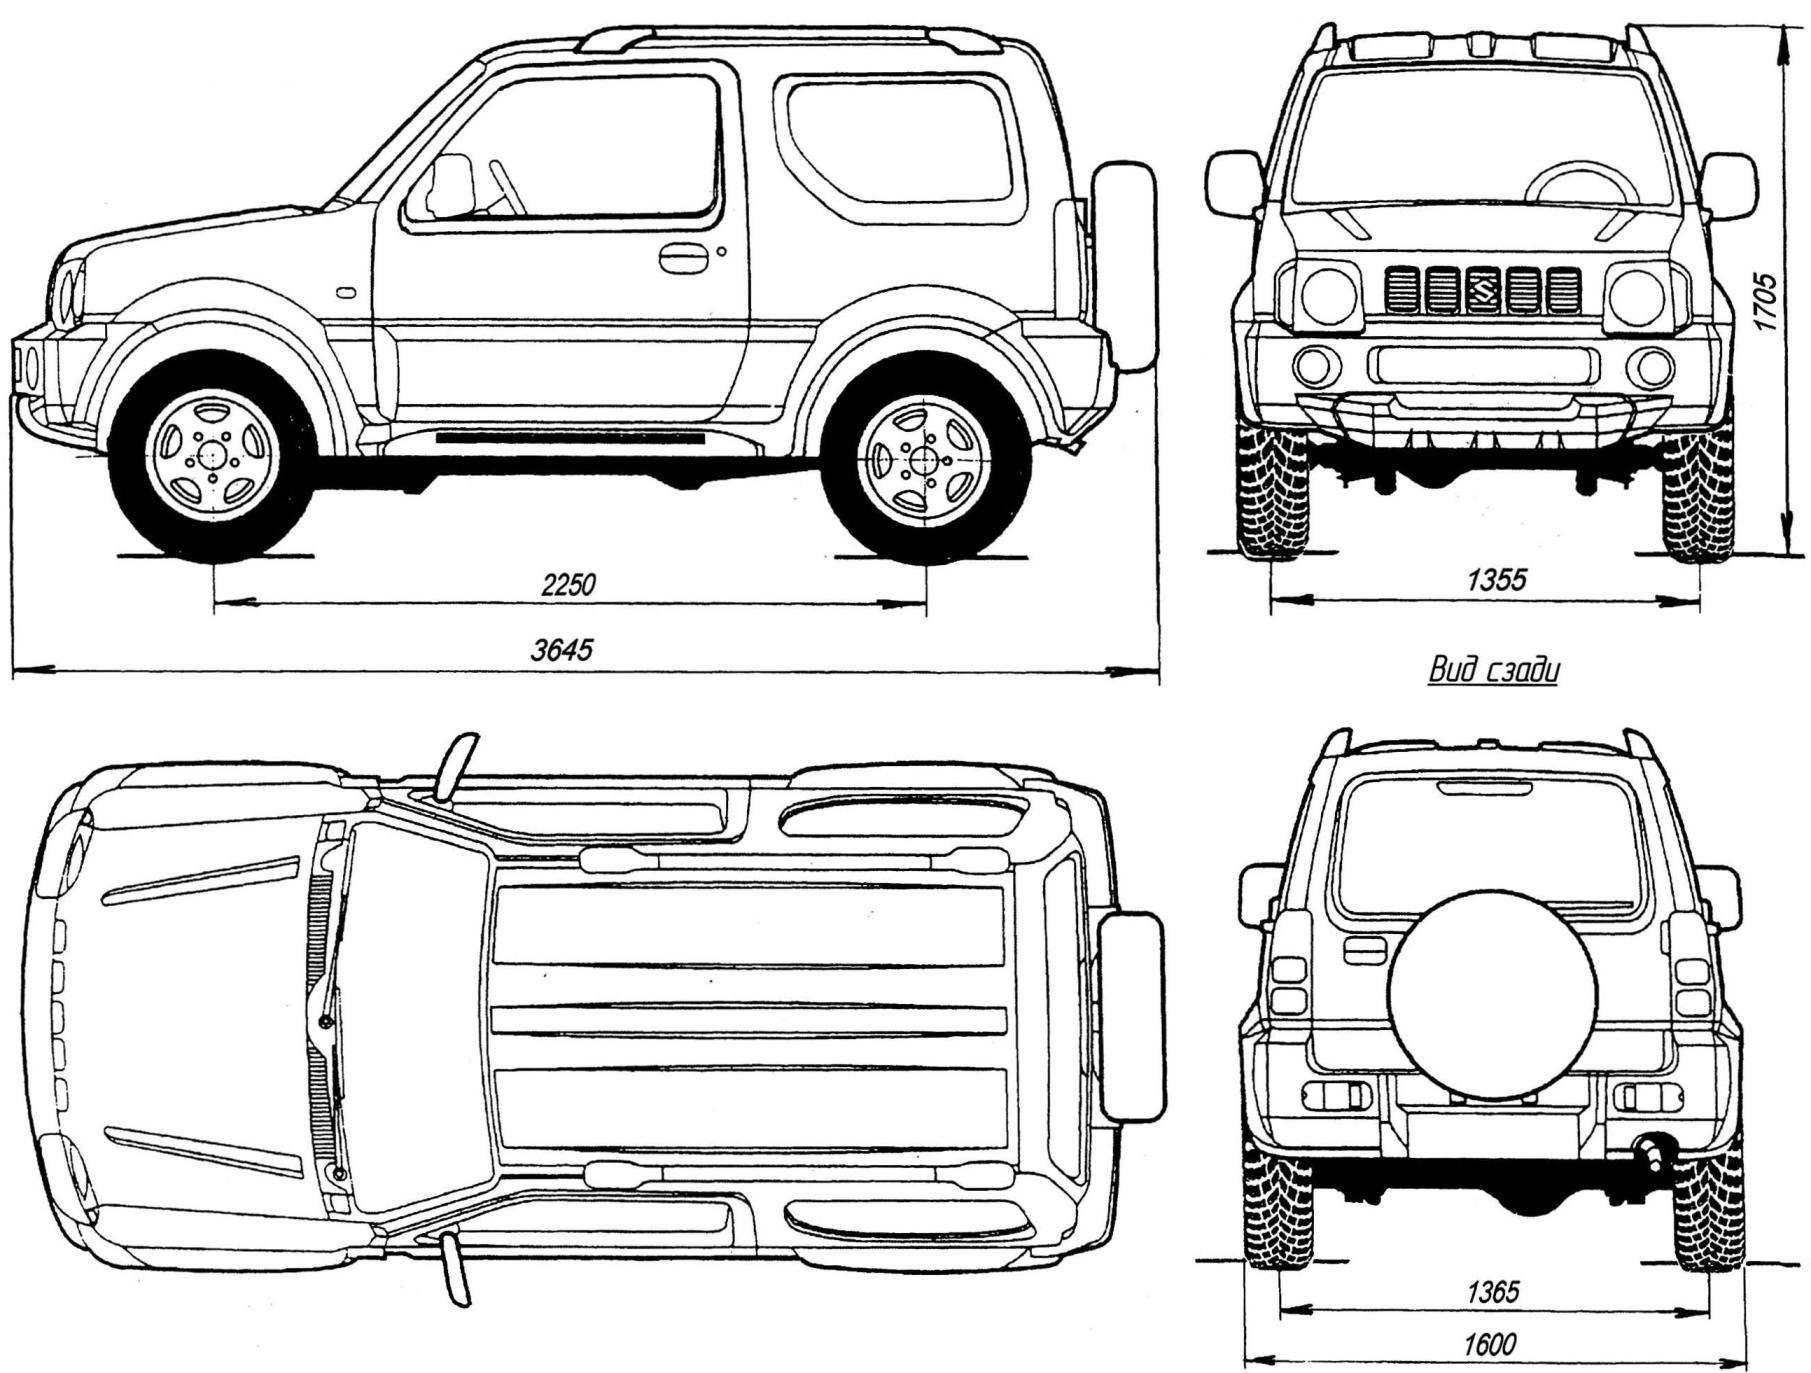 Suzuki Sj Chassis Sumally T 4x4 Scale And